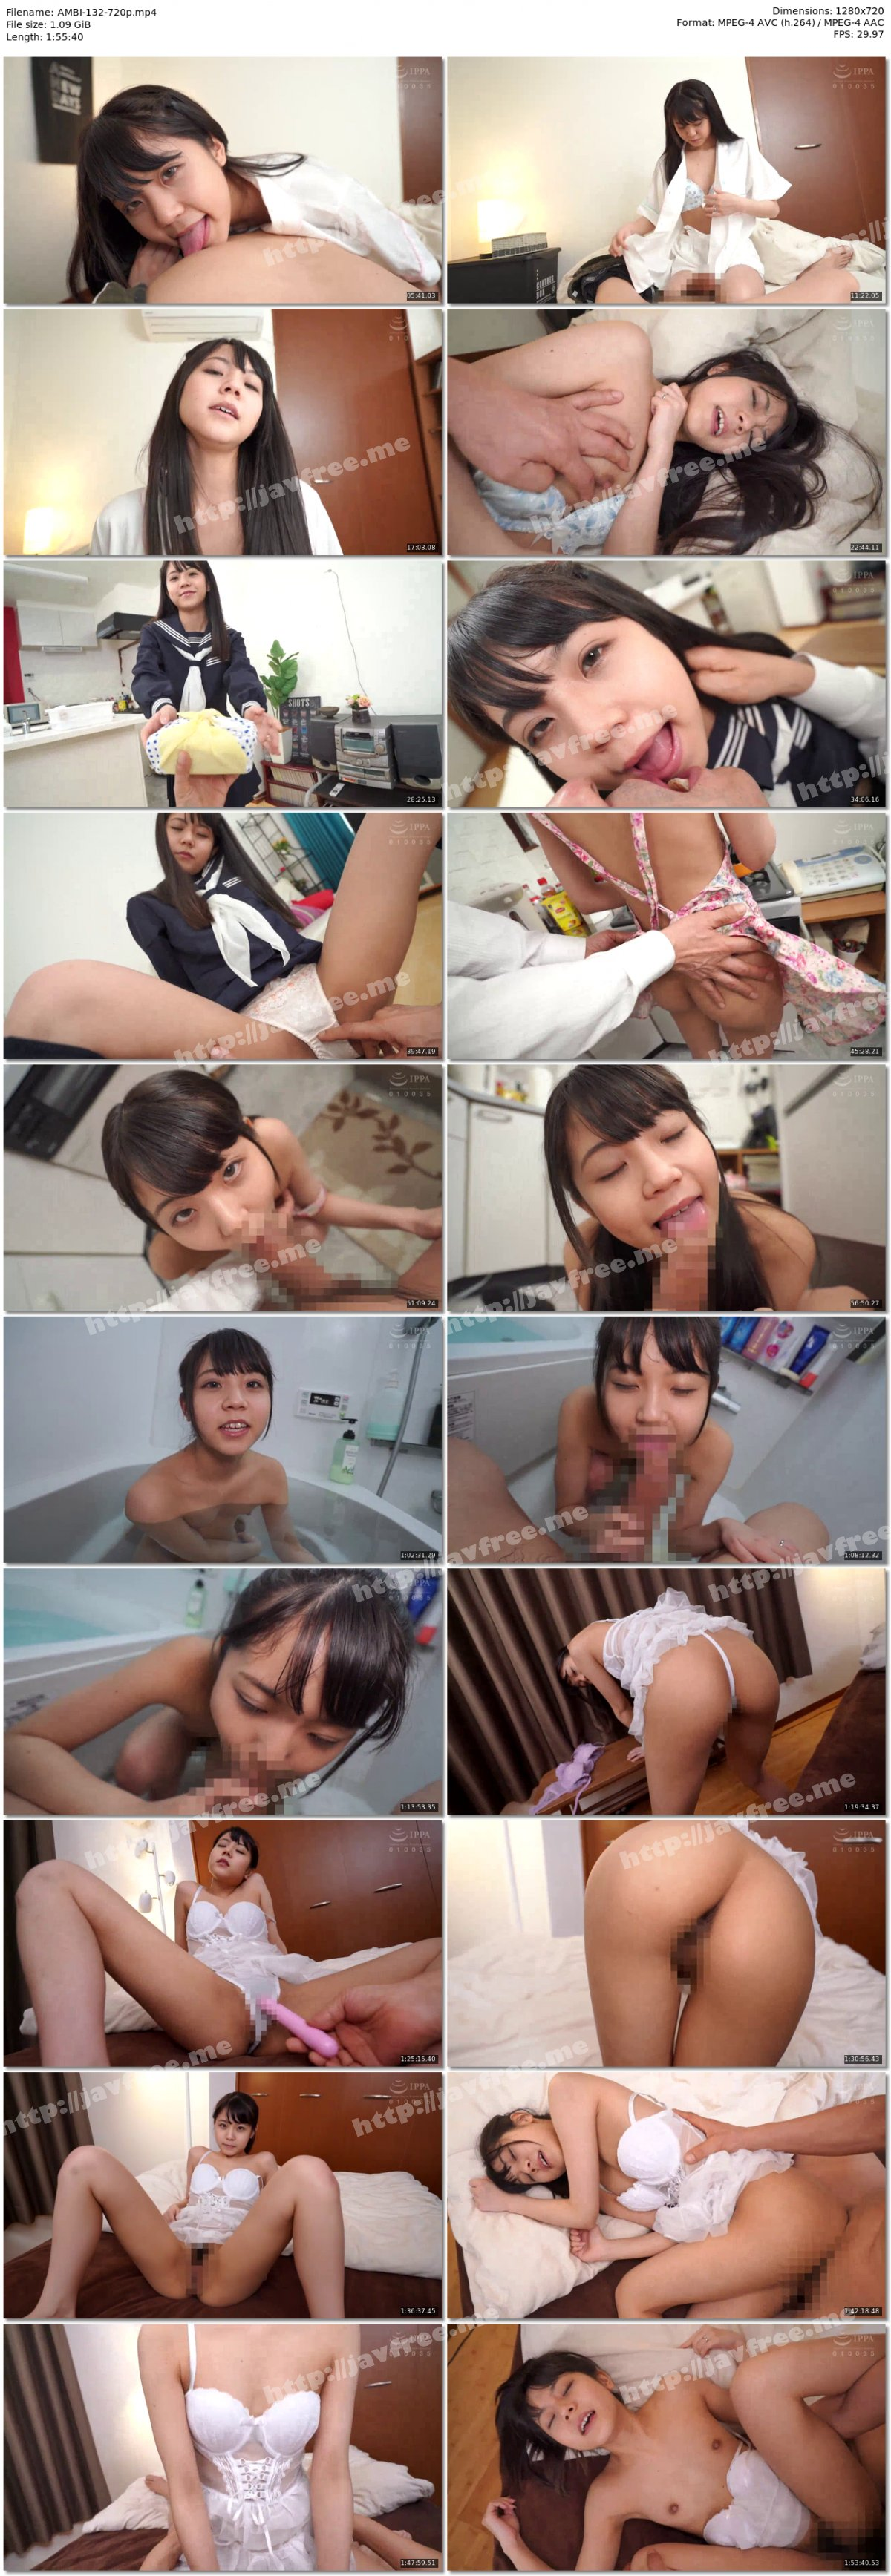 [HD][NACR-442] 若くて綺麗な父の後妻が淫乱で痴女だった件。 黒川すみれ - image AMBI-132-720p on https://javfree.me